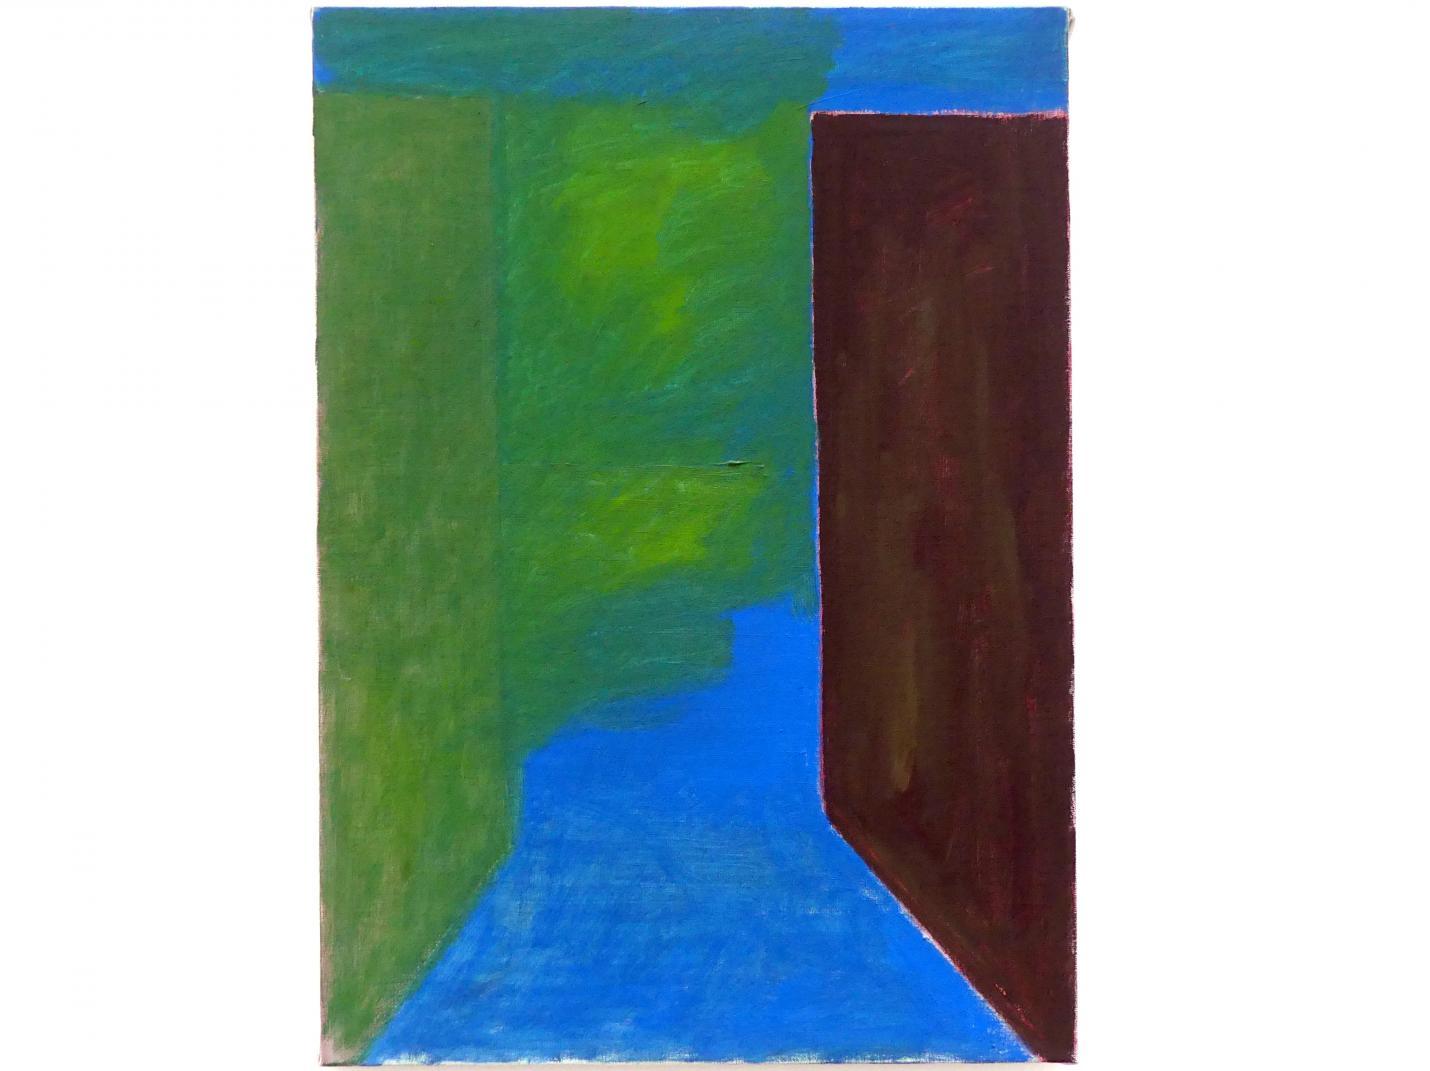 Raoul De Keyser: Kamer - Zimmer, 1989